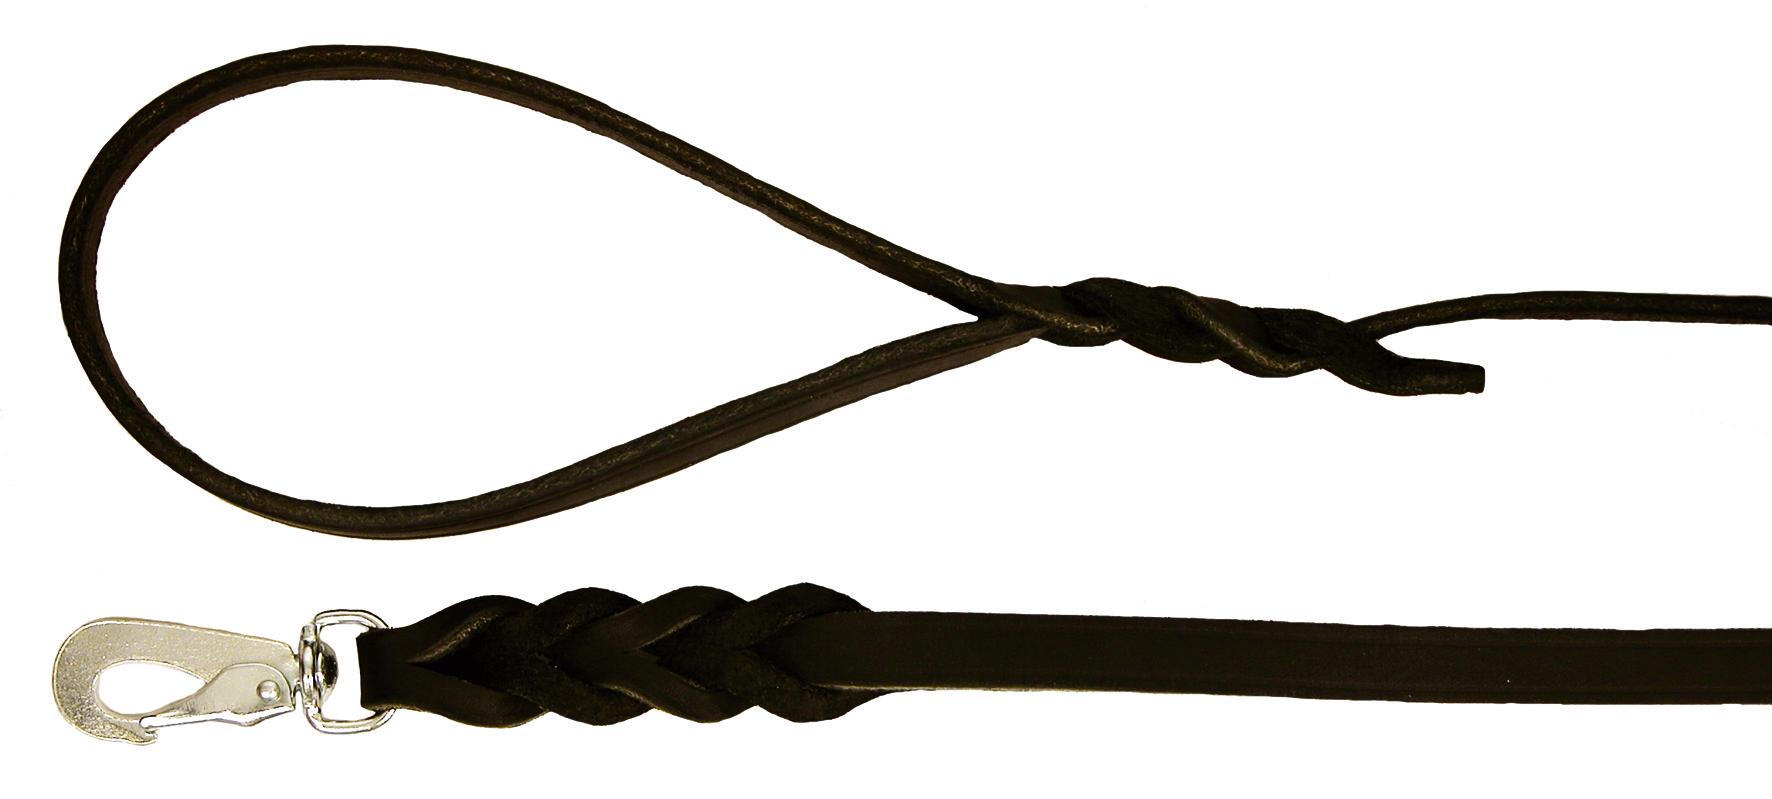 Alac Läderkoppel långt XS 220-250cm